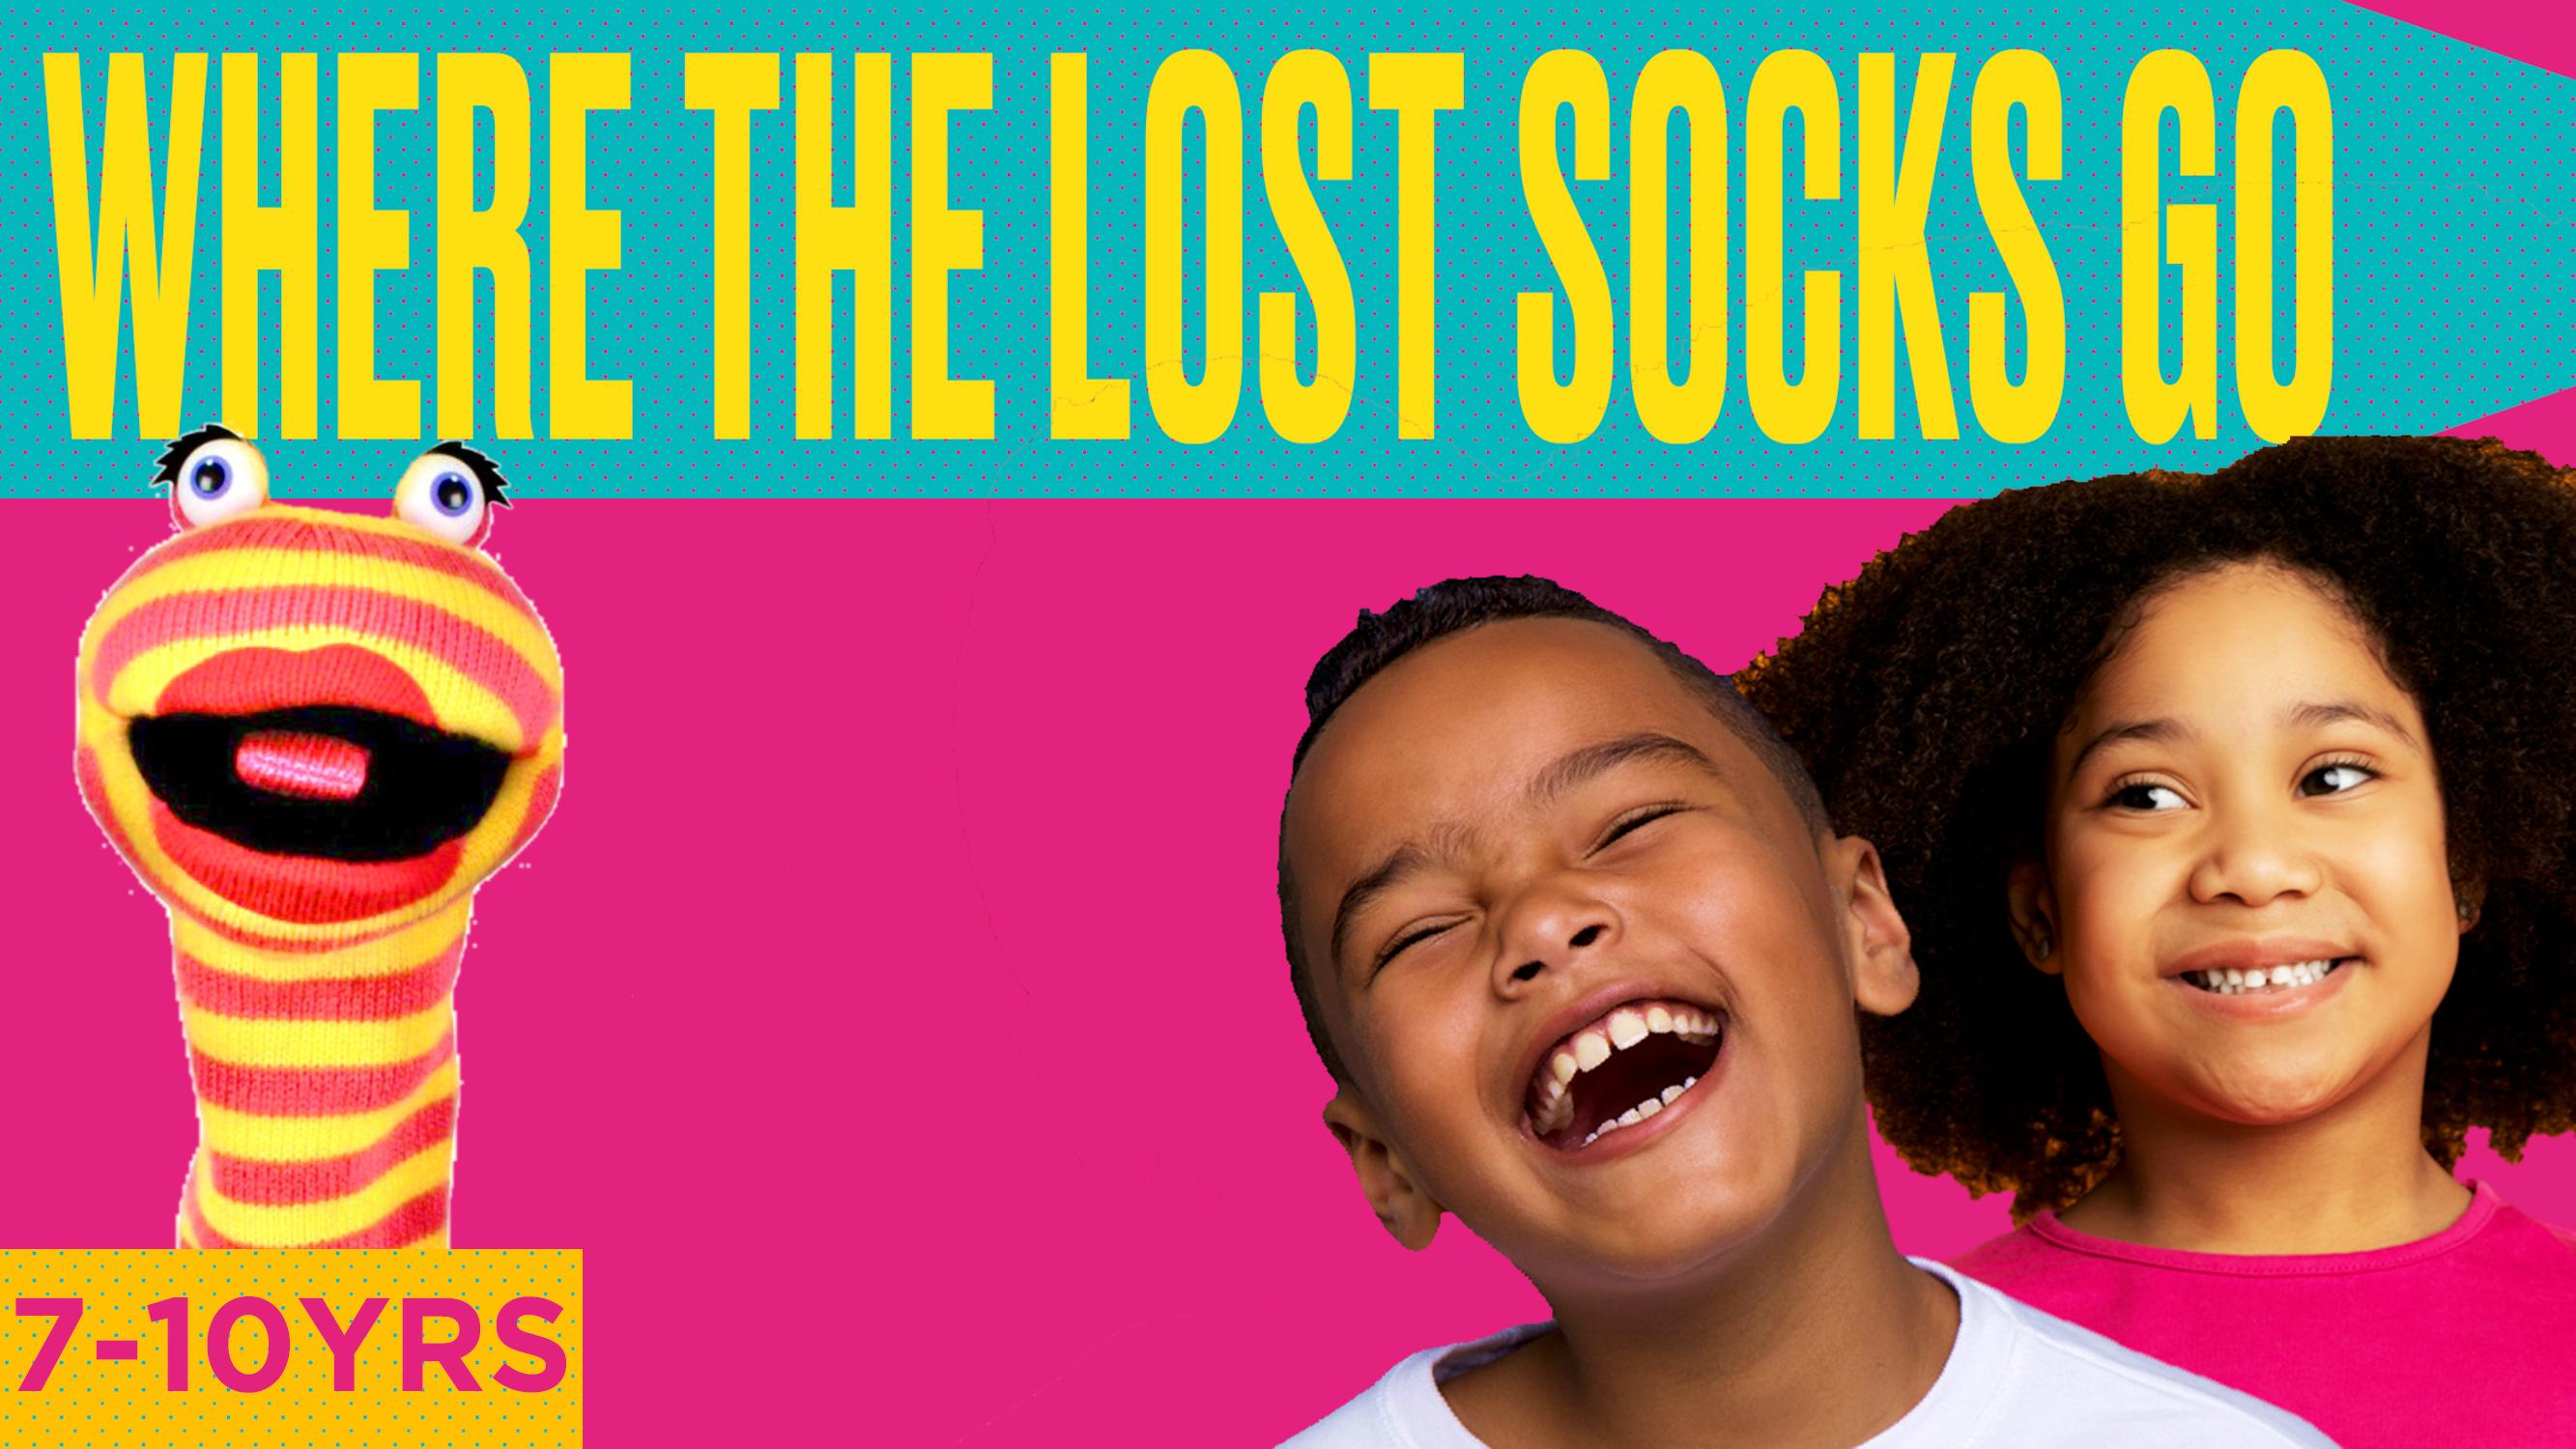 Lost Socks for website